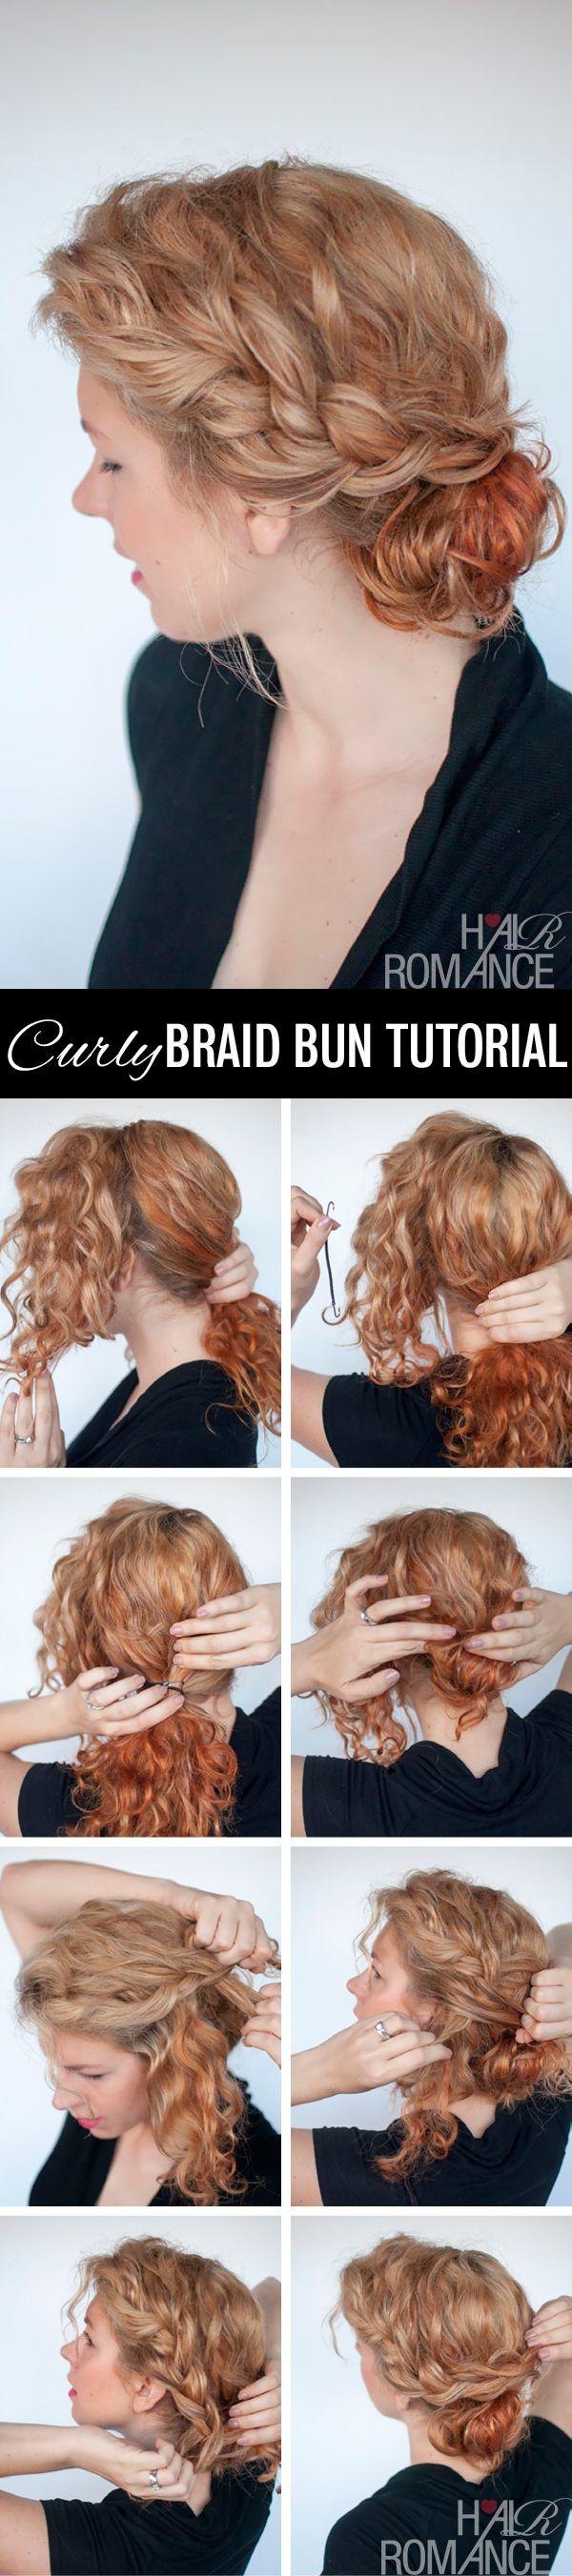 Sensational 1000 Ideas About Bun Hair Tutorials On Pinterest Hair Tutorials Short Hairstyles Gunalazisus